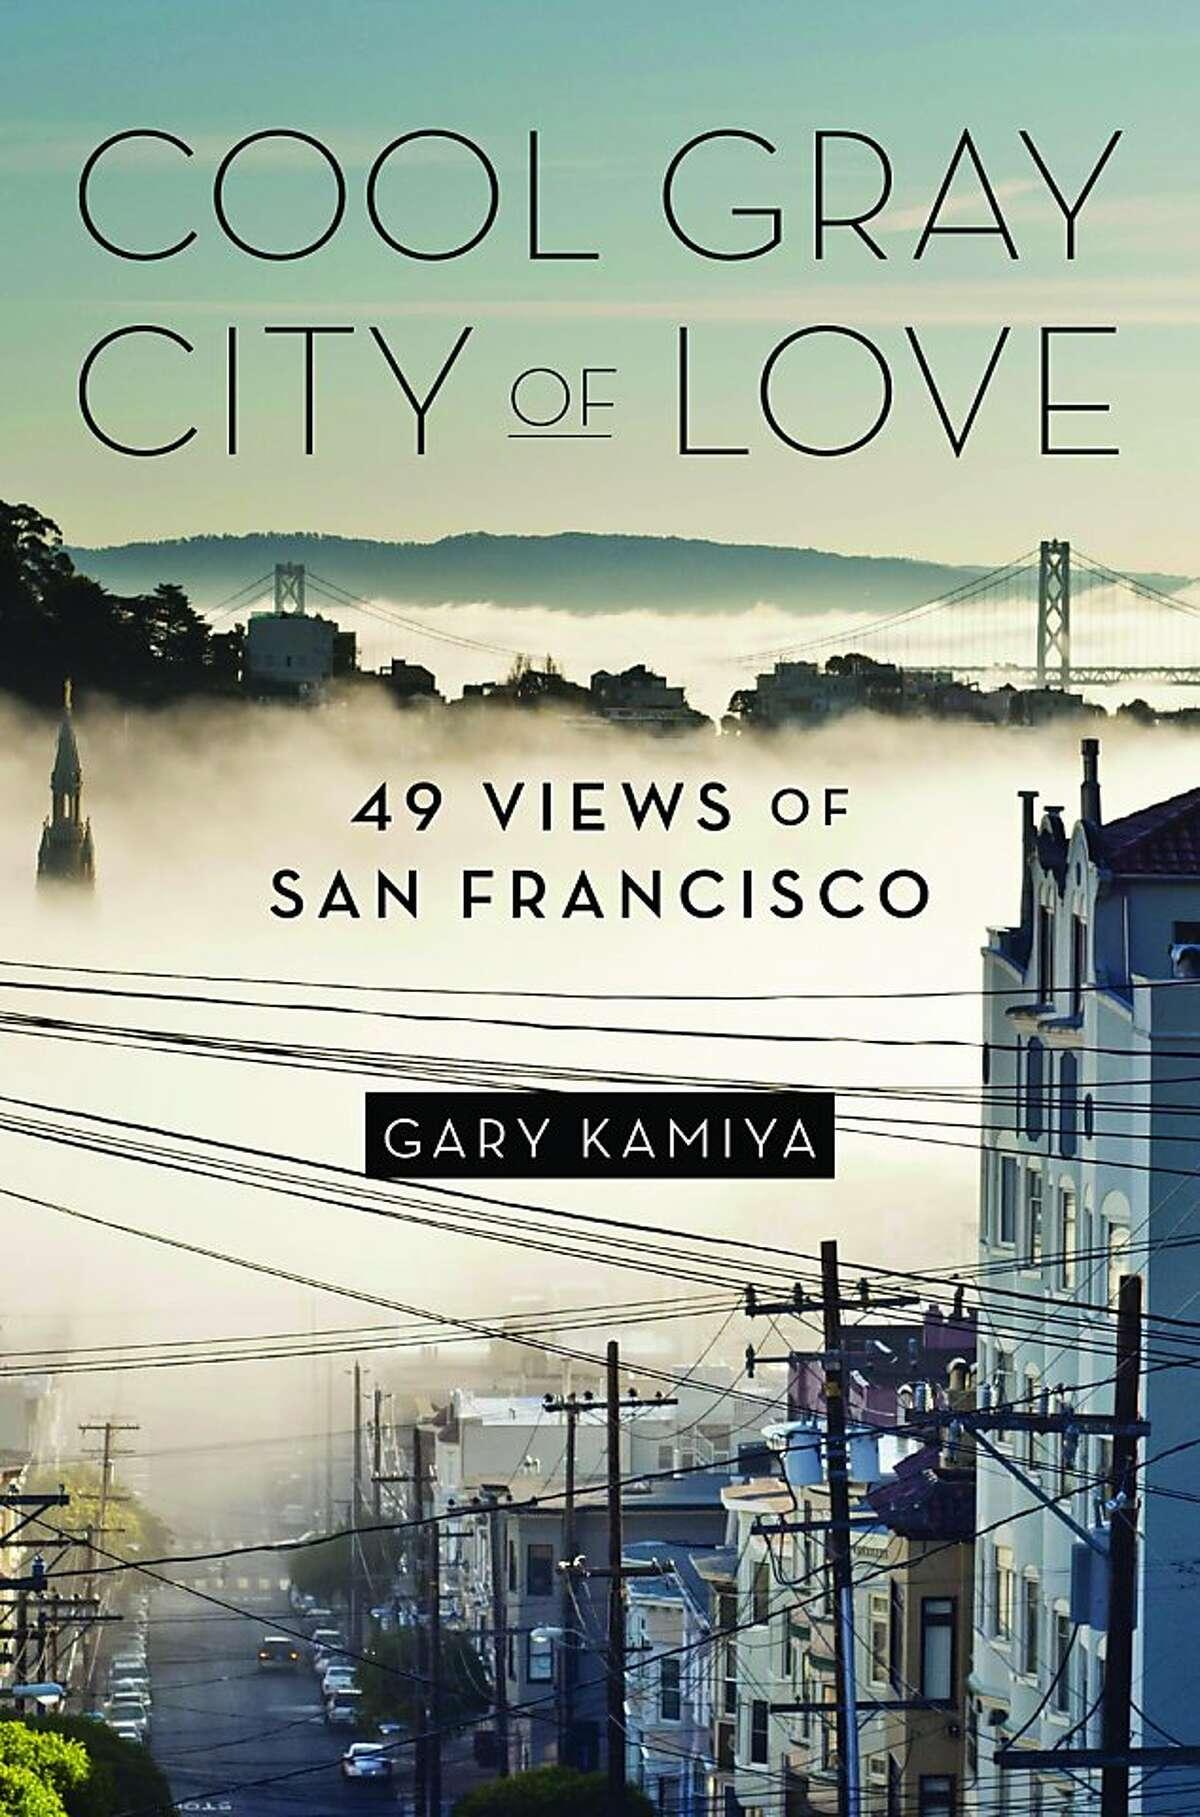 Cool Gray City of Love, by Gary Kamiya